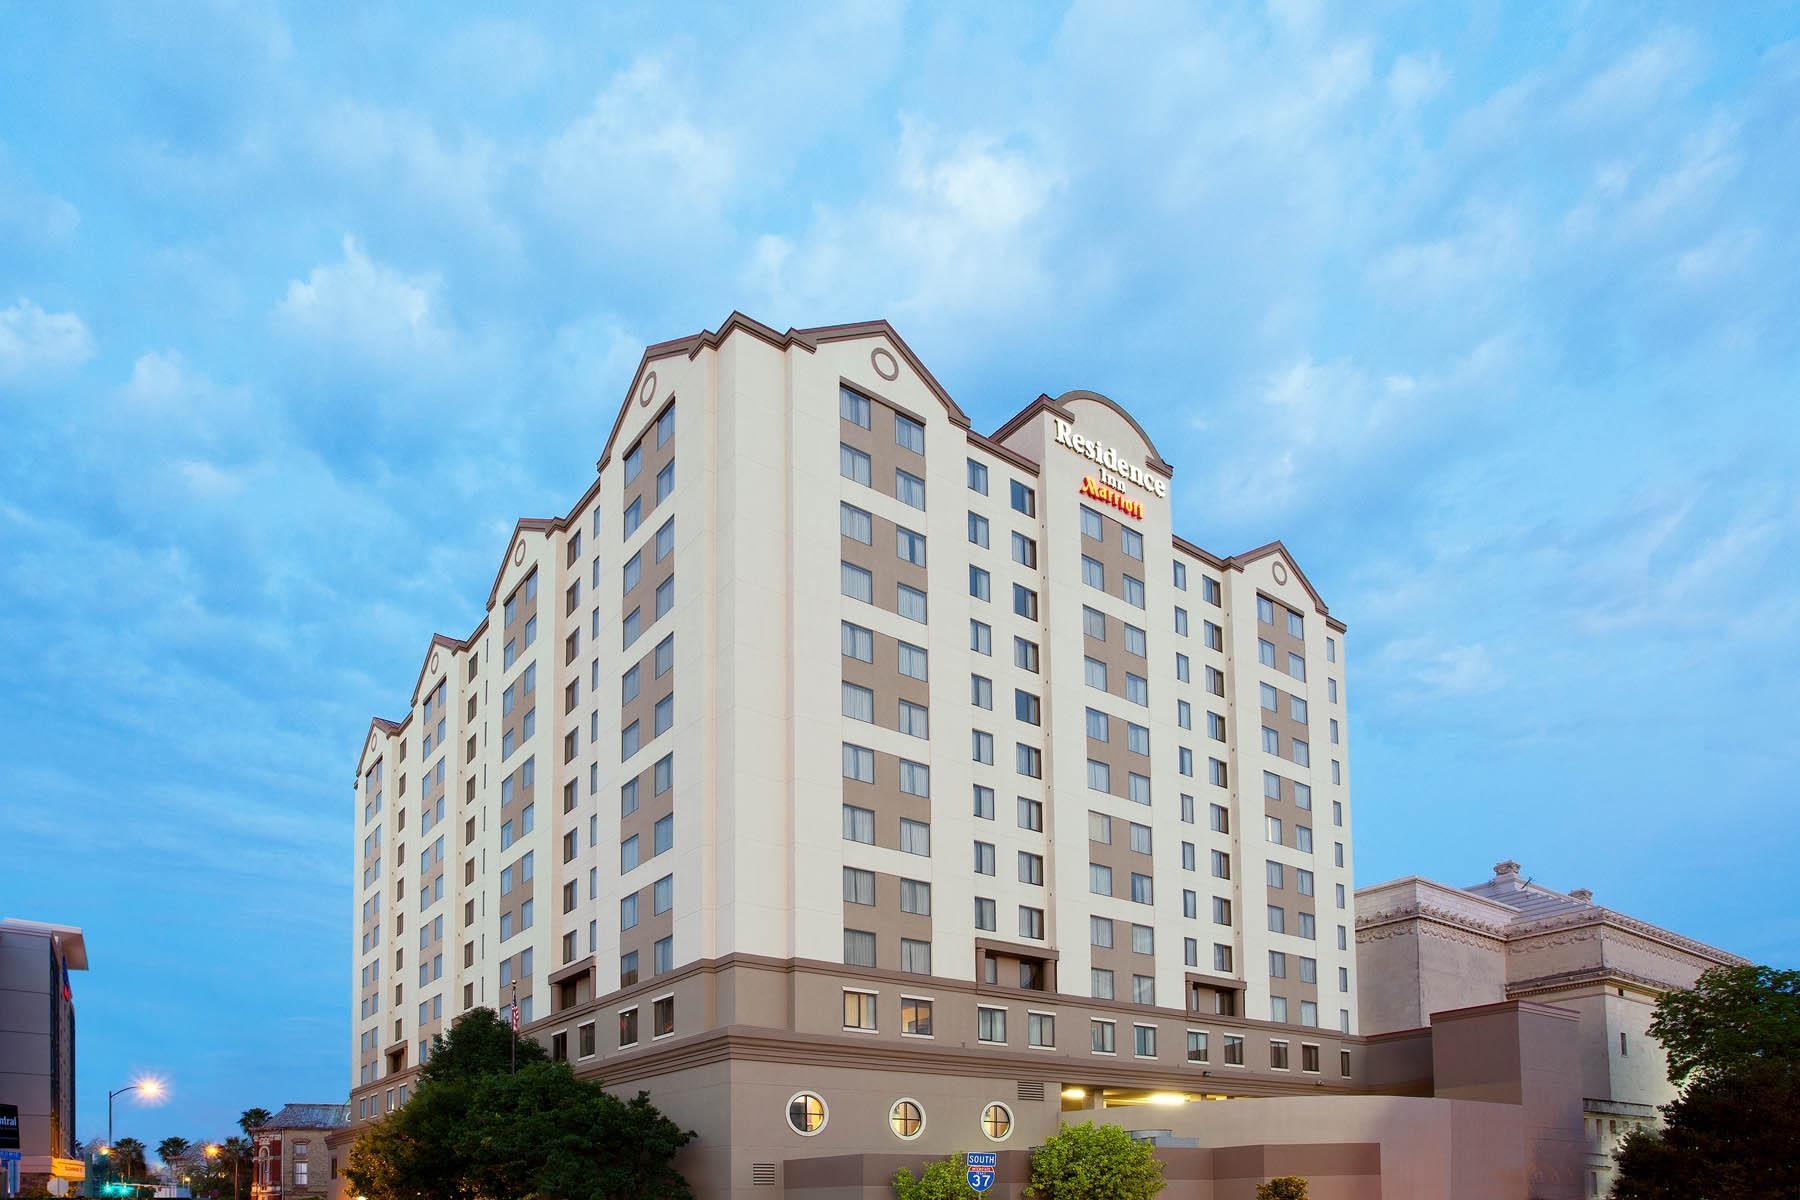 Residence Inn By Marriott San Antonio Downtown Alamo Plaza